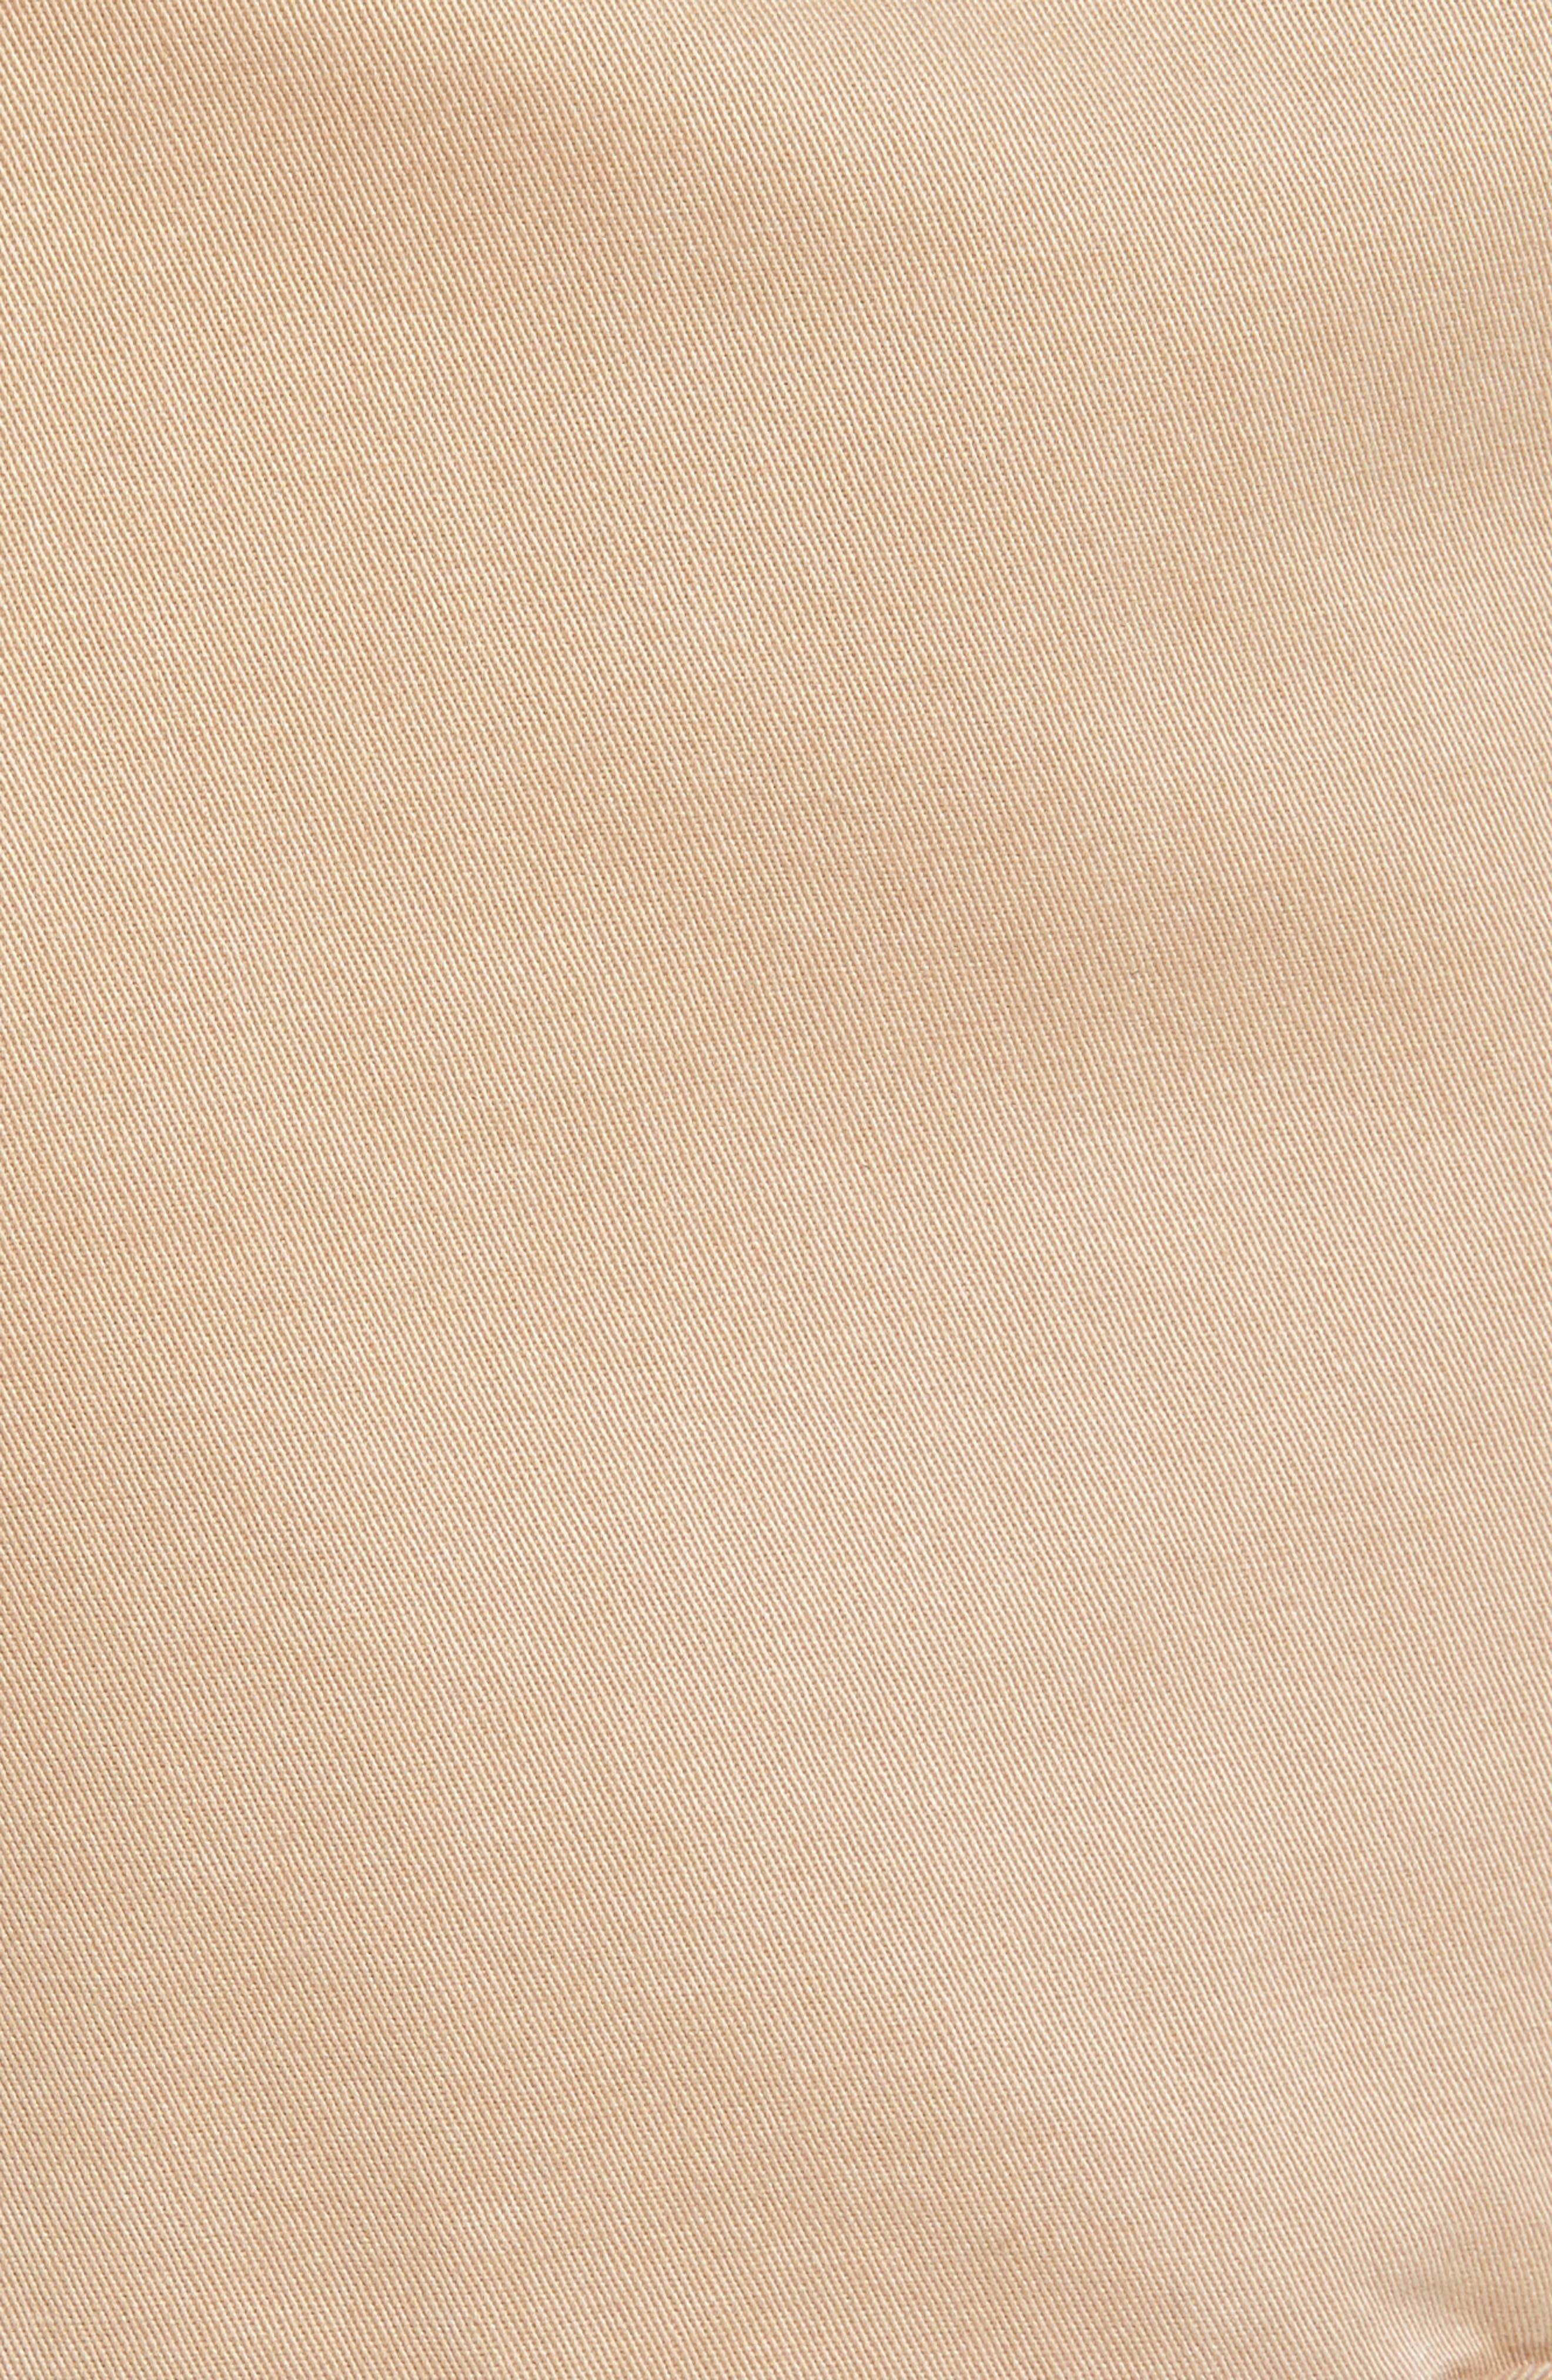 Campbell Cargo Shorts,                             Alternate thumbnail 5, color,                             Khaki